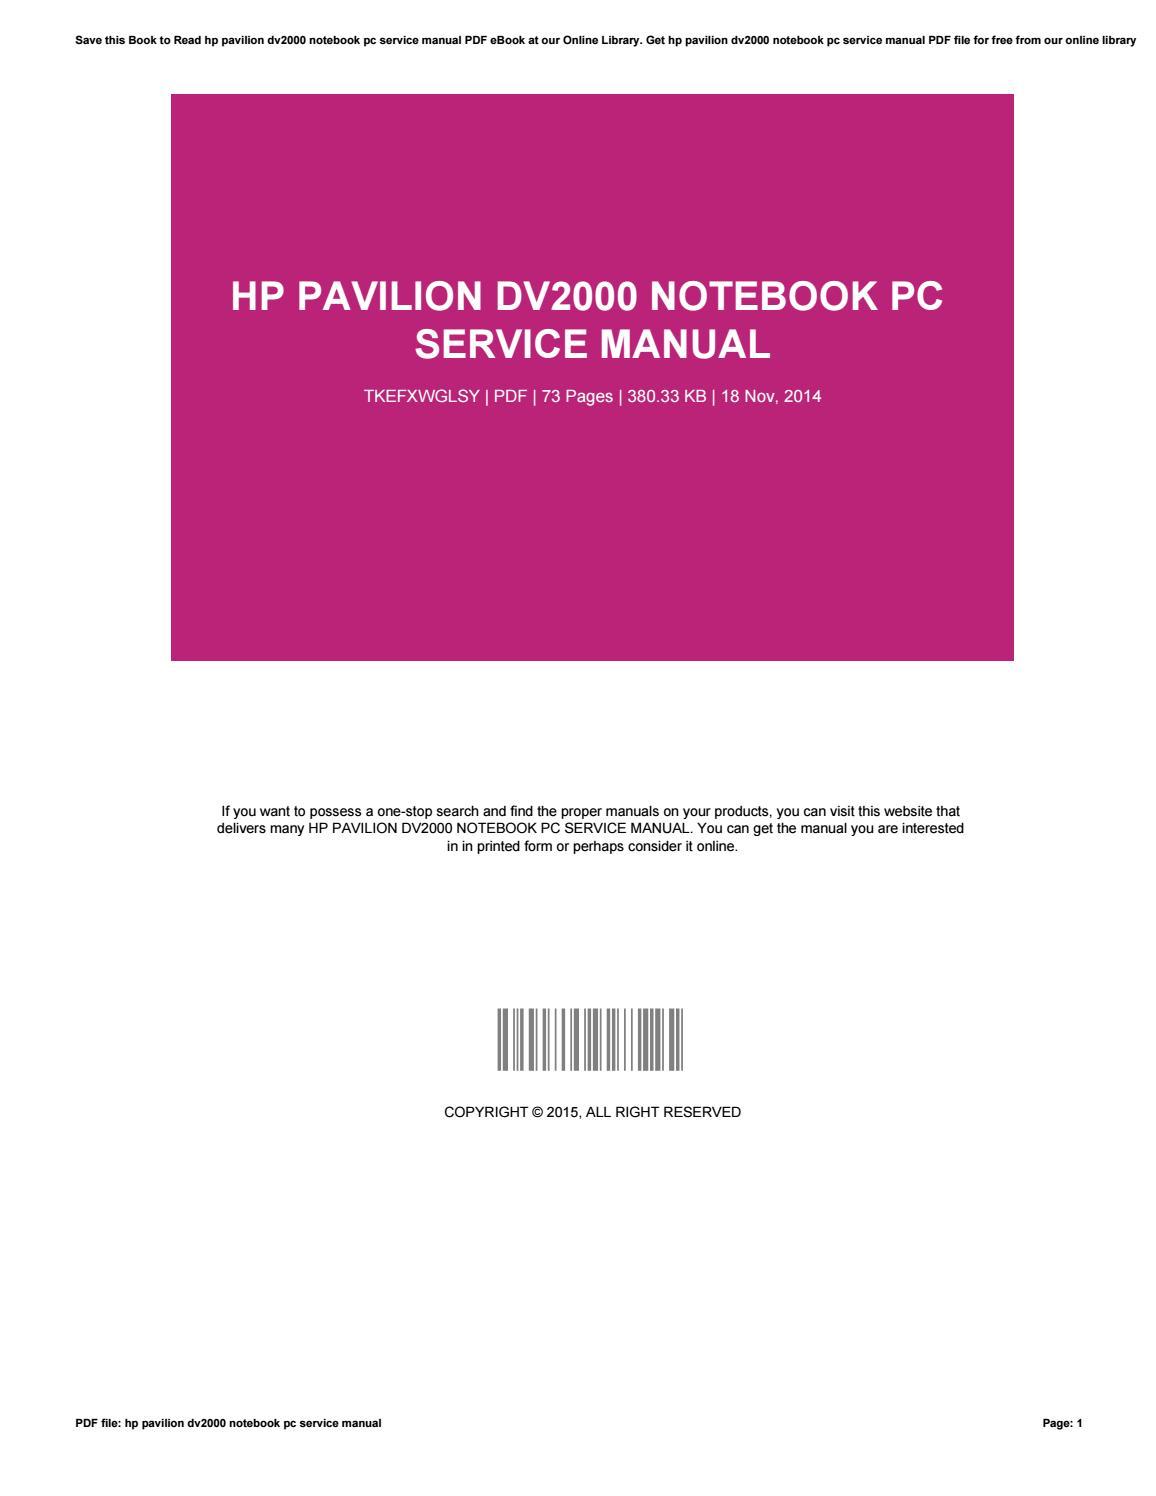 hp pavilion dv2000 notebook pc service manual by randydantzler4285 rh issuu com HP Pavilion Dv2000 Problems HP Pavilion Dv2000 Screen